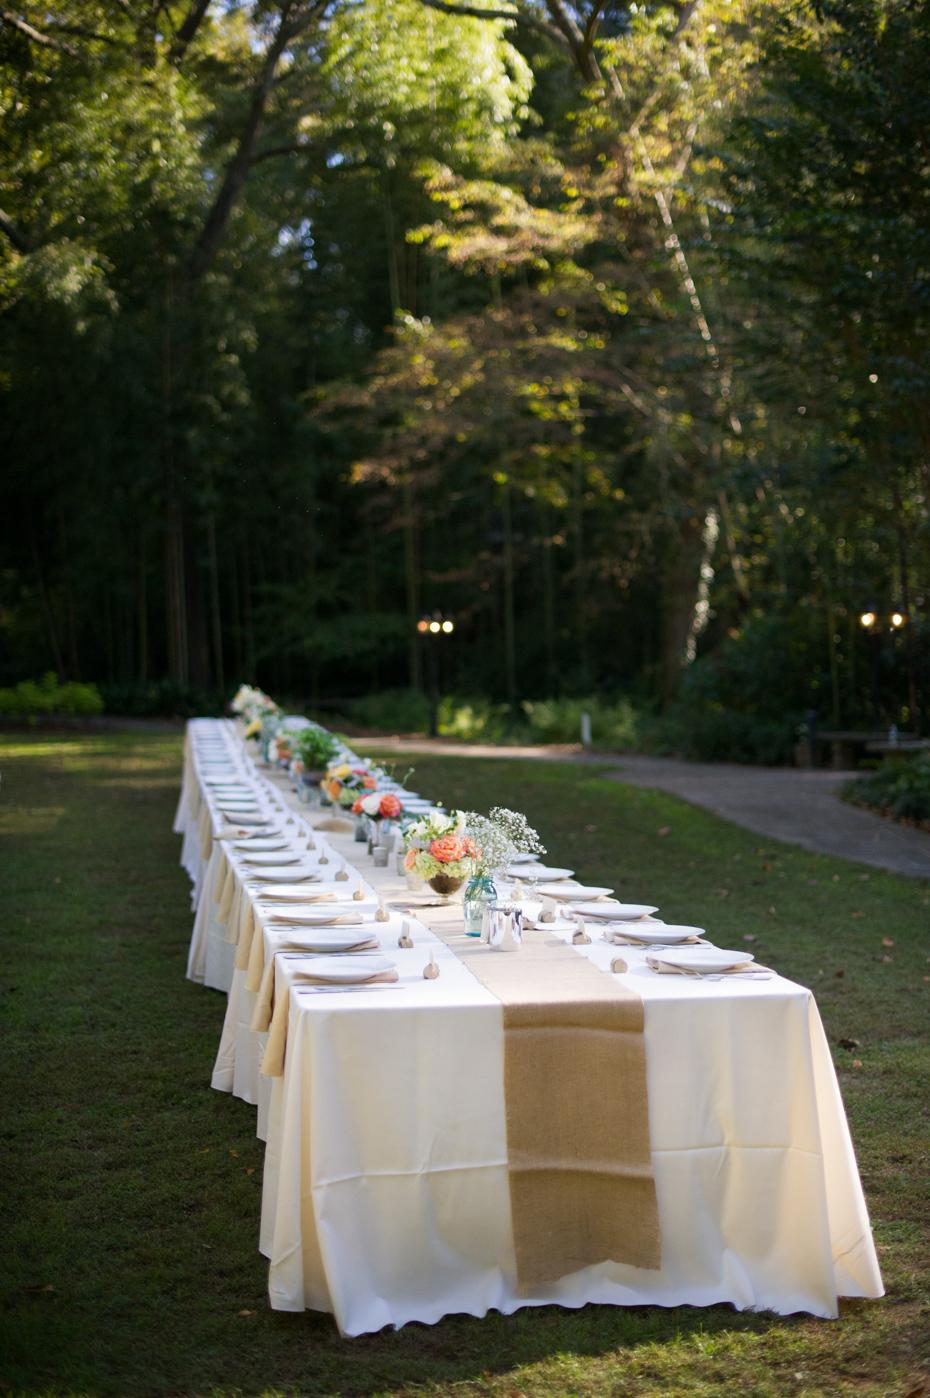 Decatur wedding venues